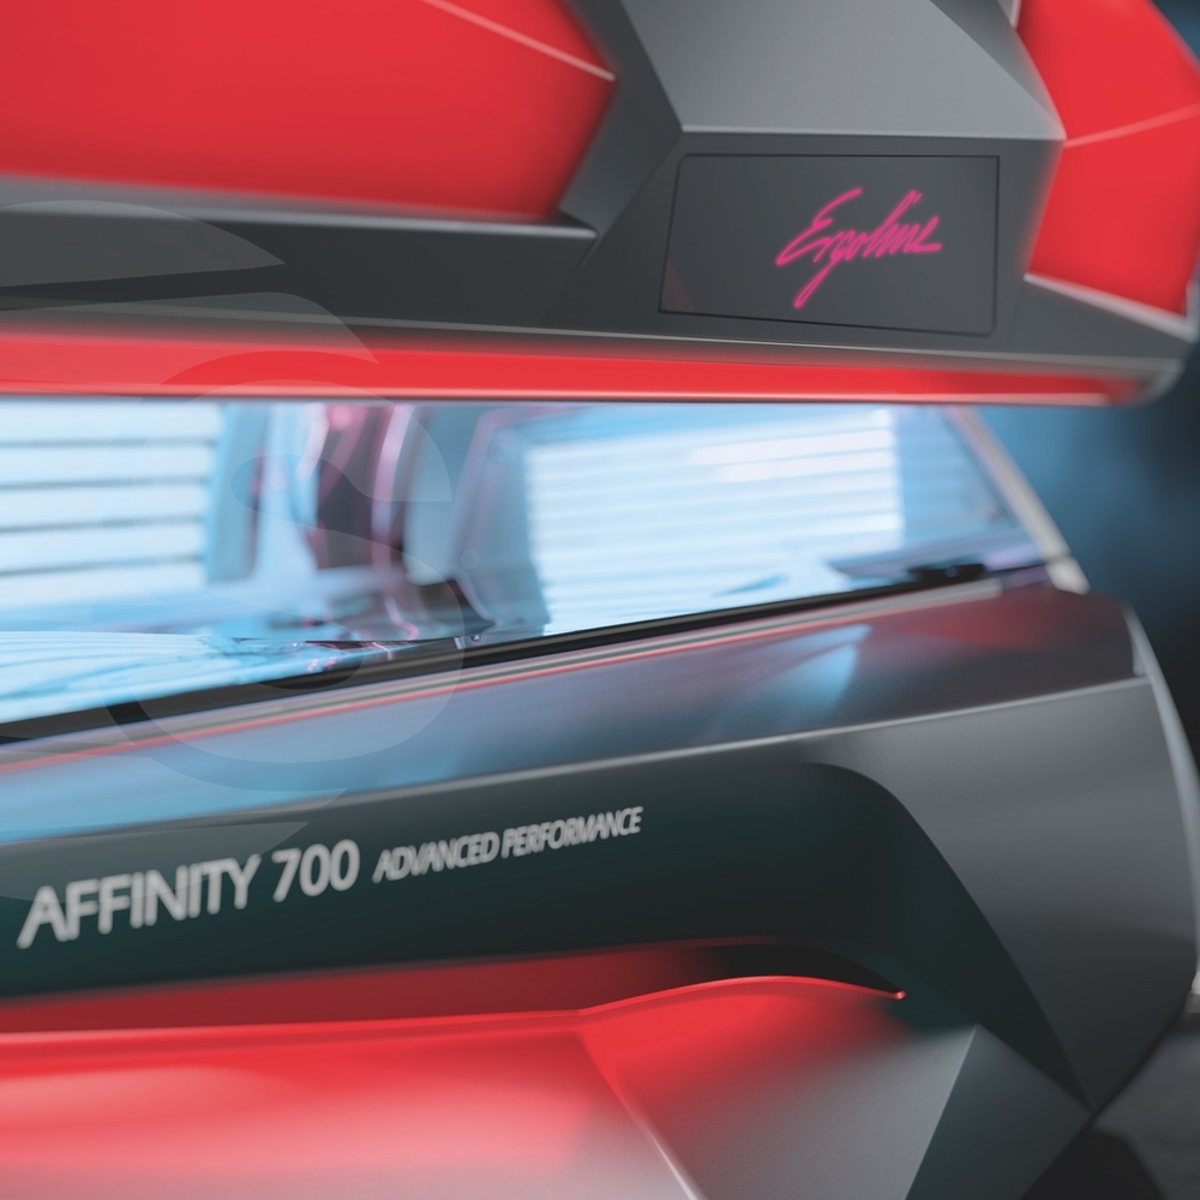 Ergoline Affinity 700 Advance Performance - Ergoline - Ergoline